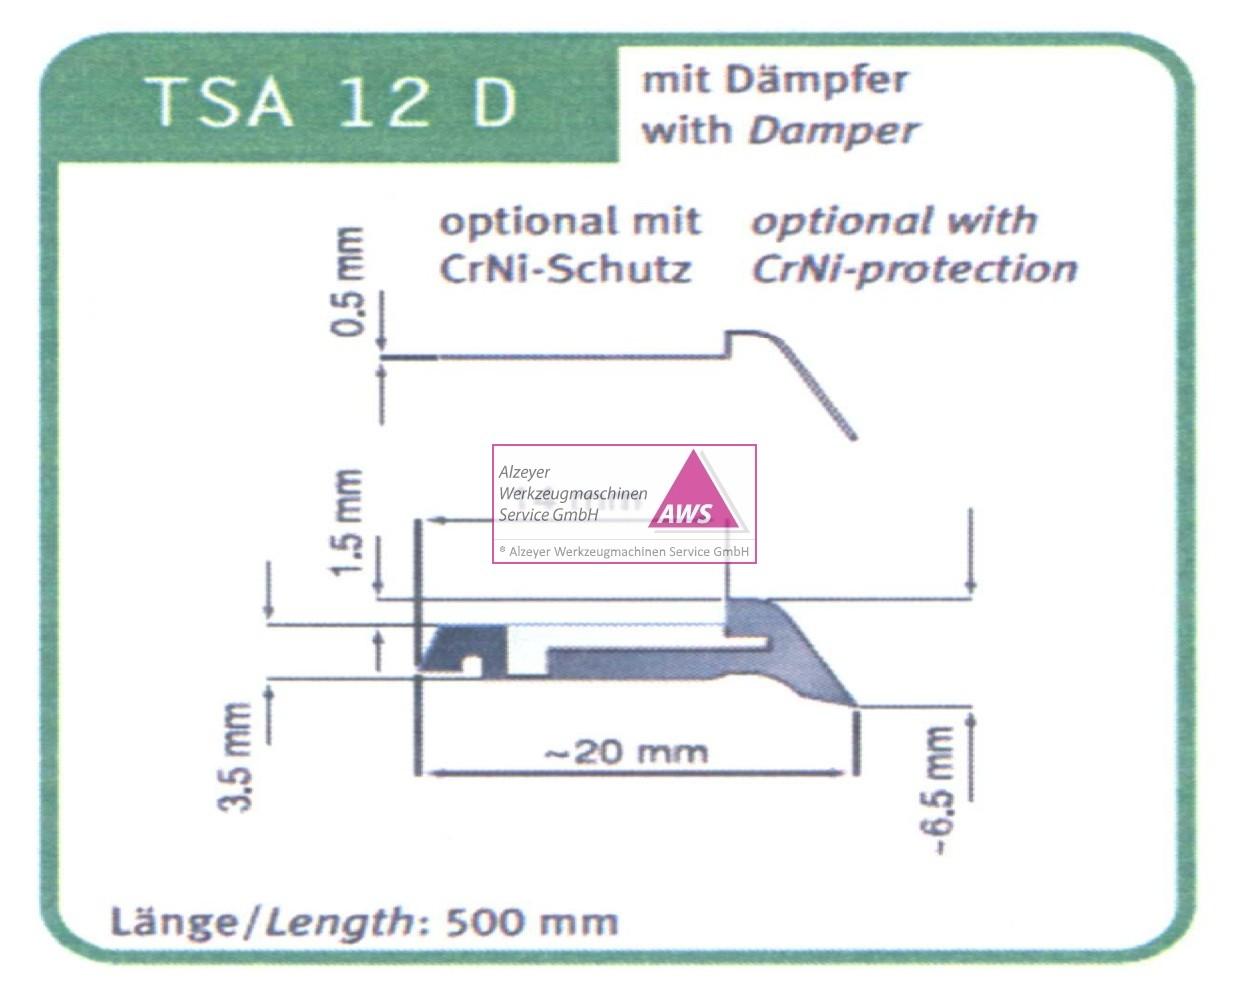 Abstreifgummi TSA - 12 D mit Dämpfer 500mm